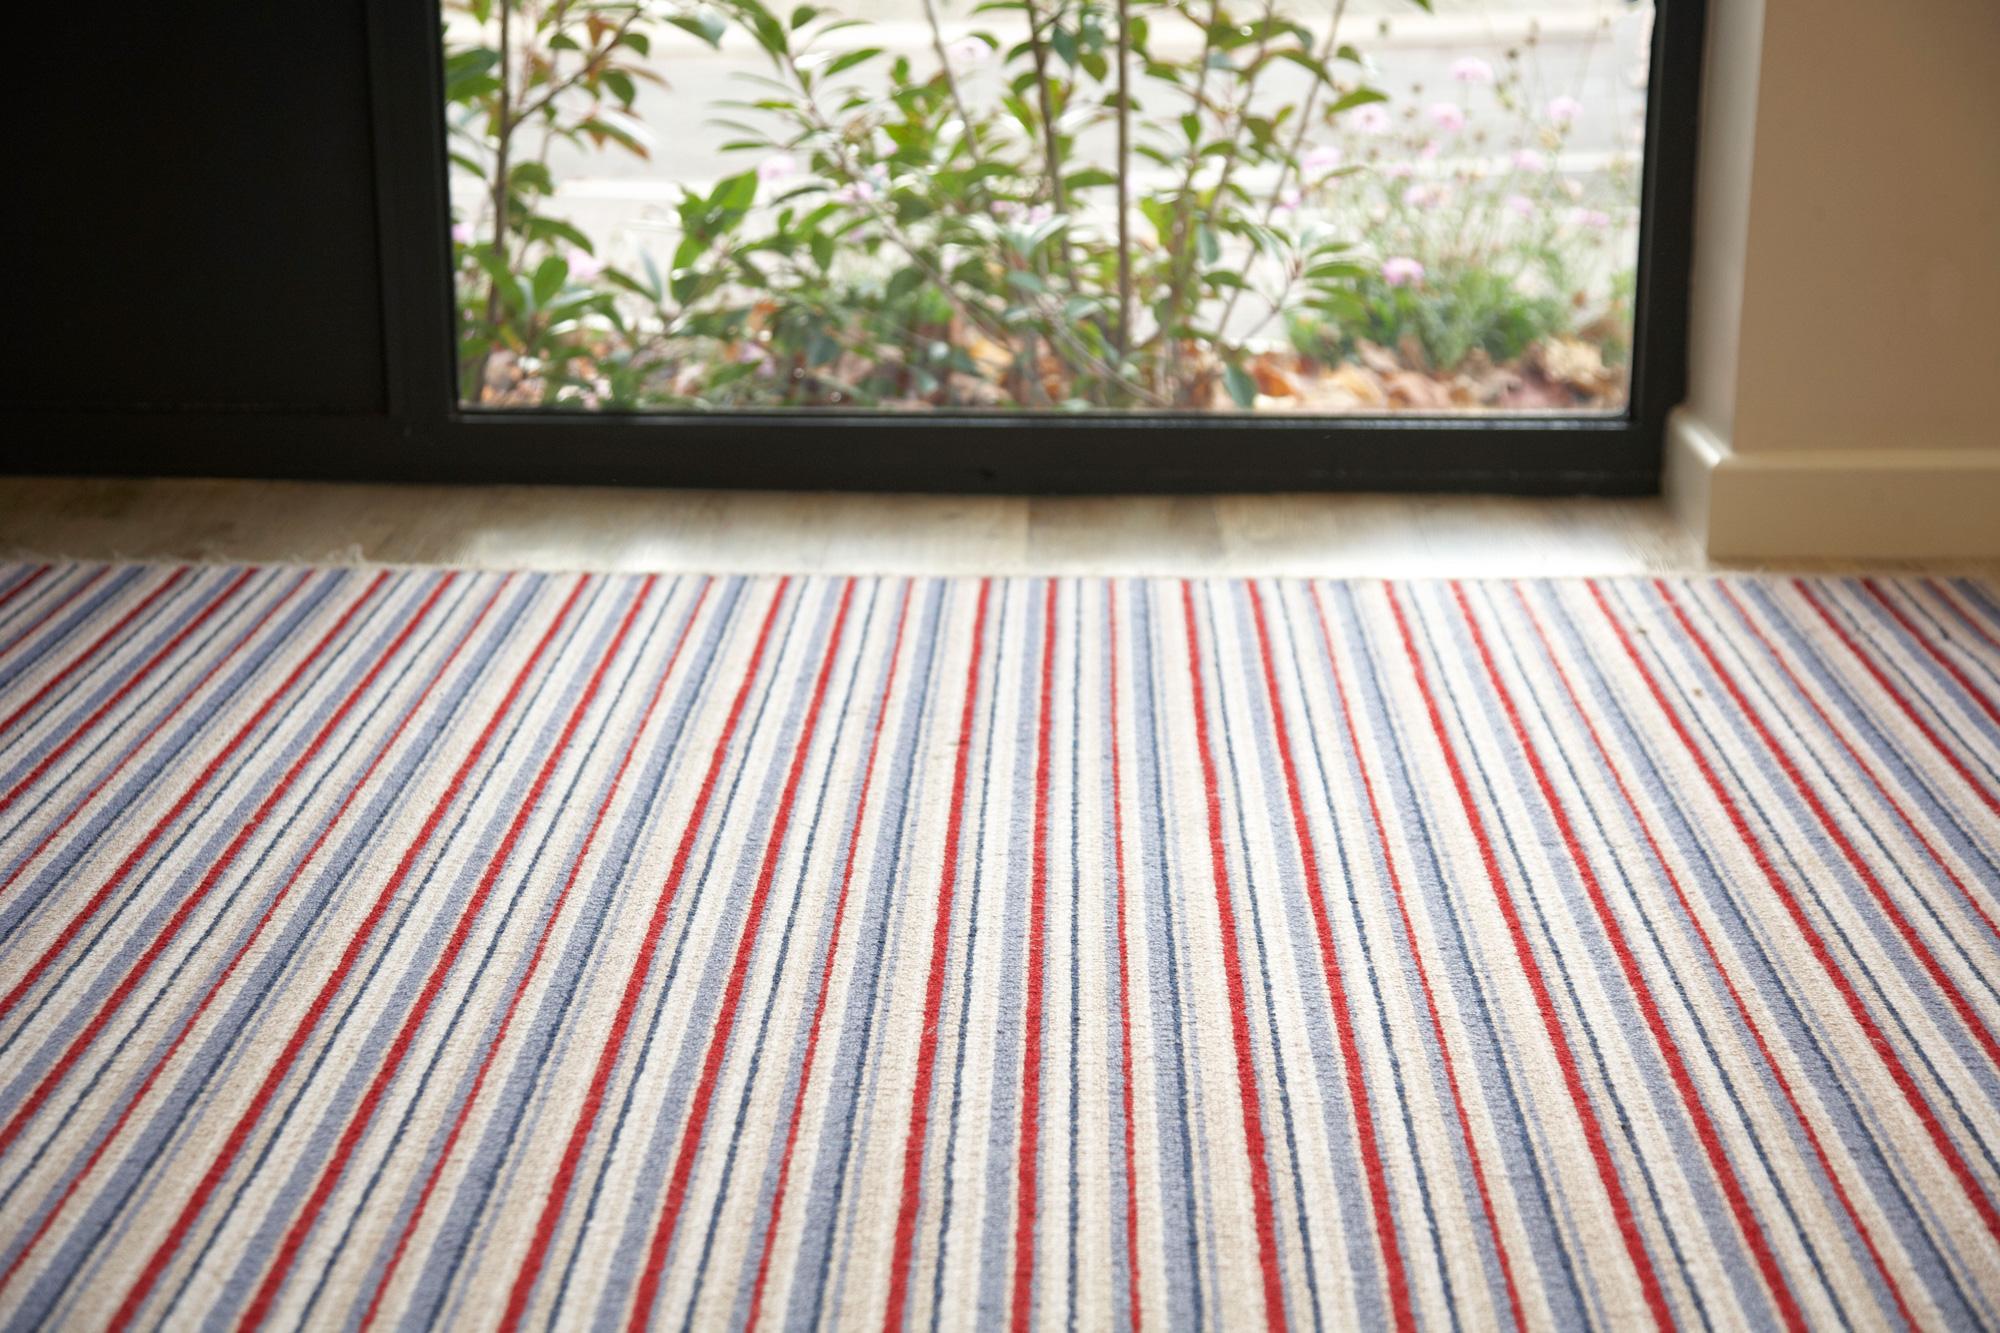 13-Decorcafe-Nikki-Rees-Alternative-flooring-striped-rug-nurseryinterior-design